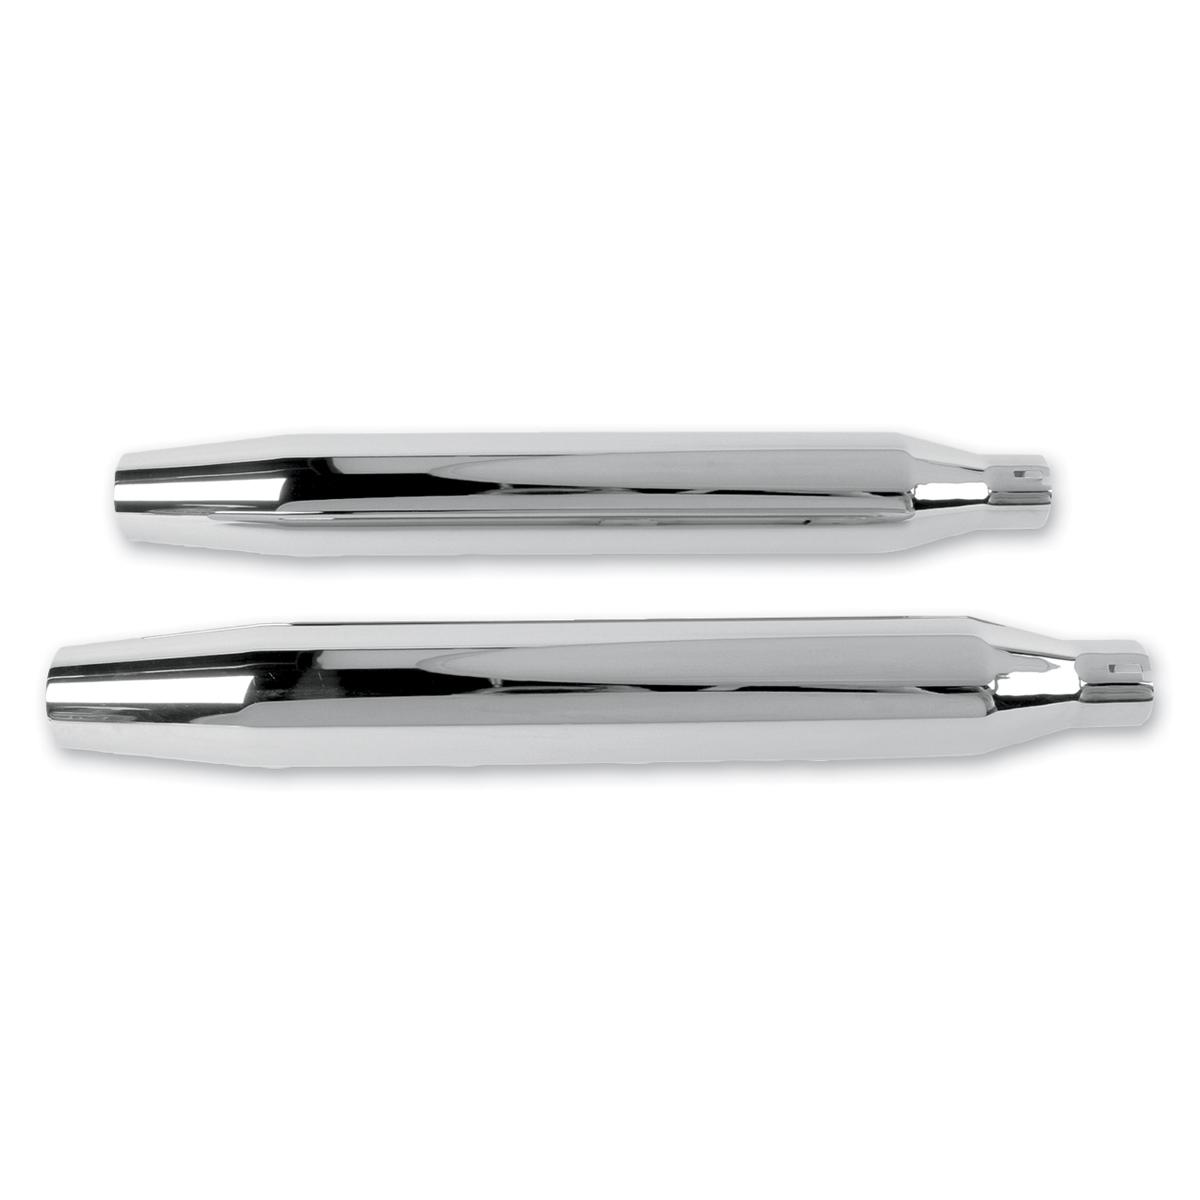 Khrome Werks HP-Plus Tapered Slip-On Mufflers